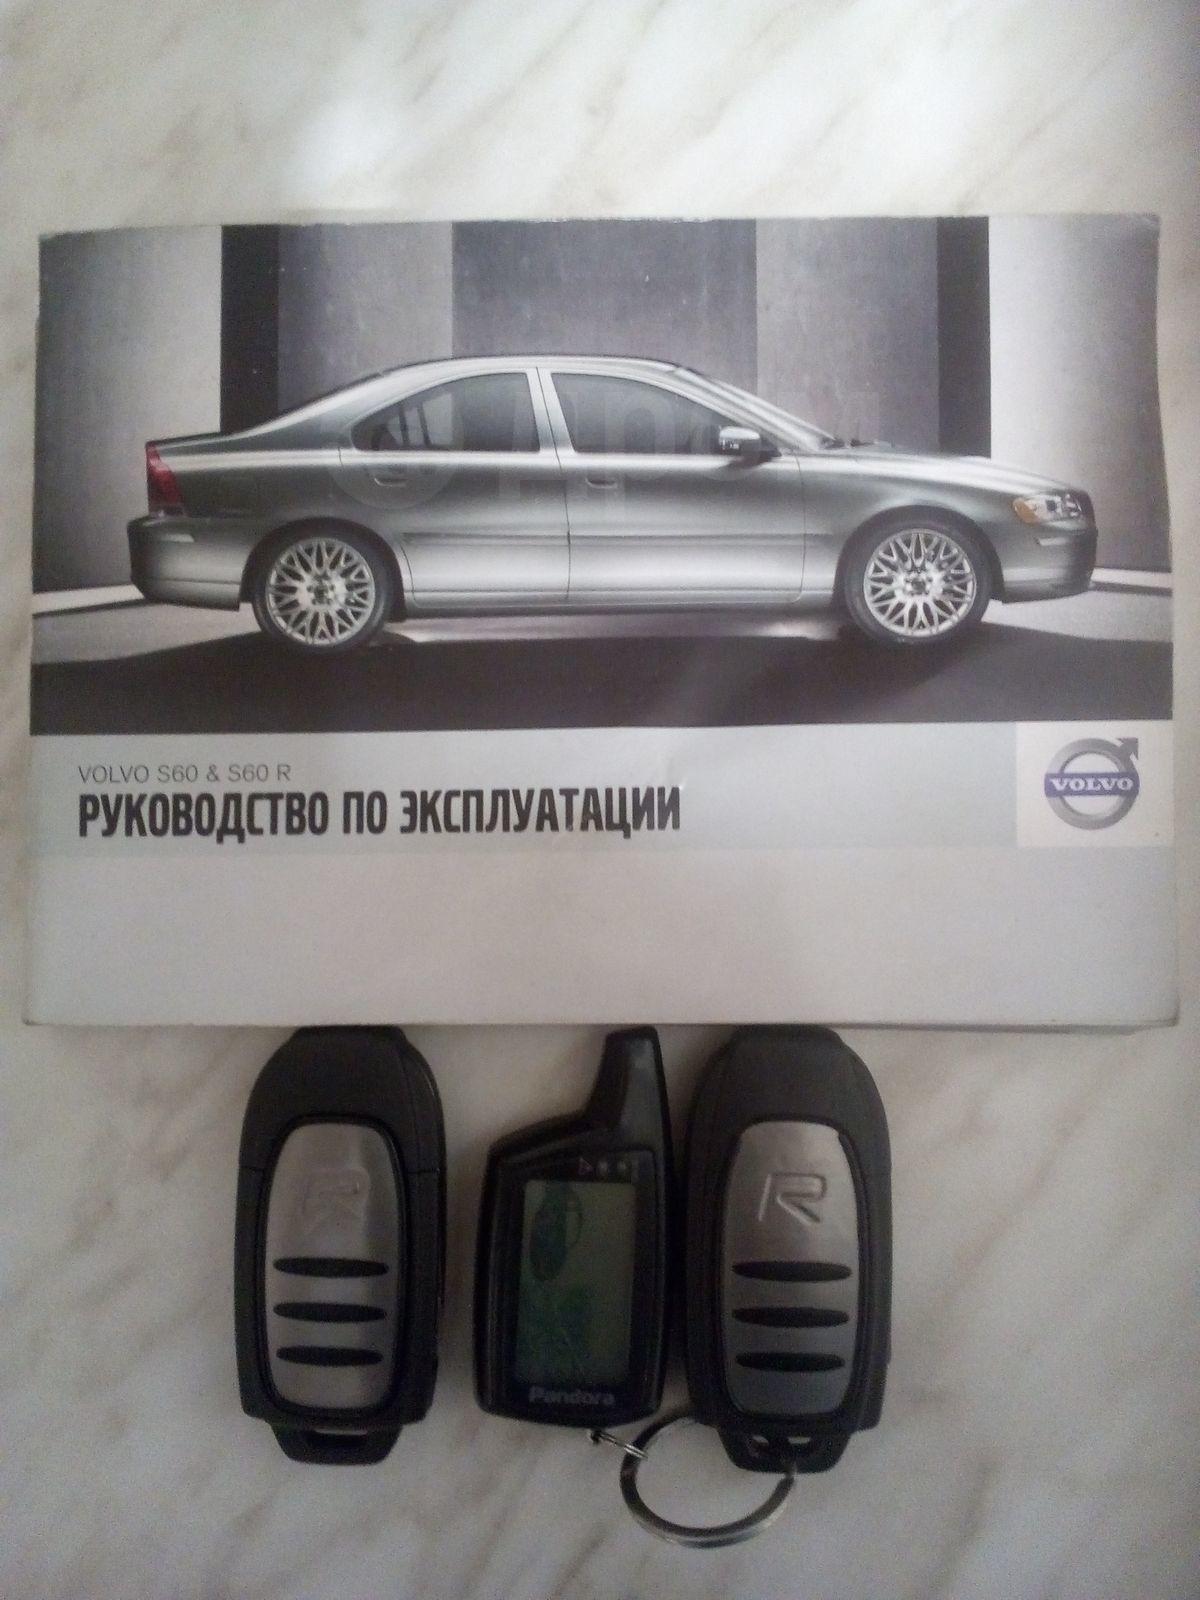 Volvo s60 инструкция по ремонту pdf